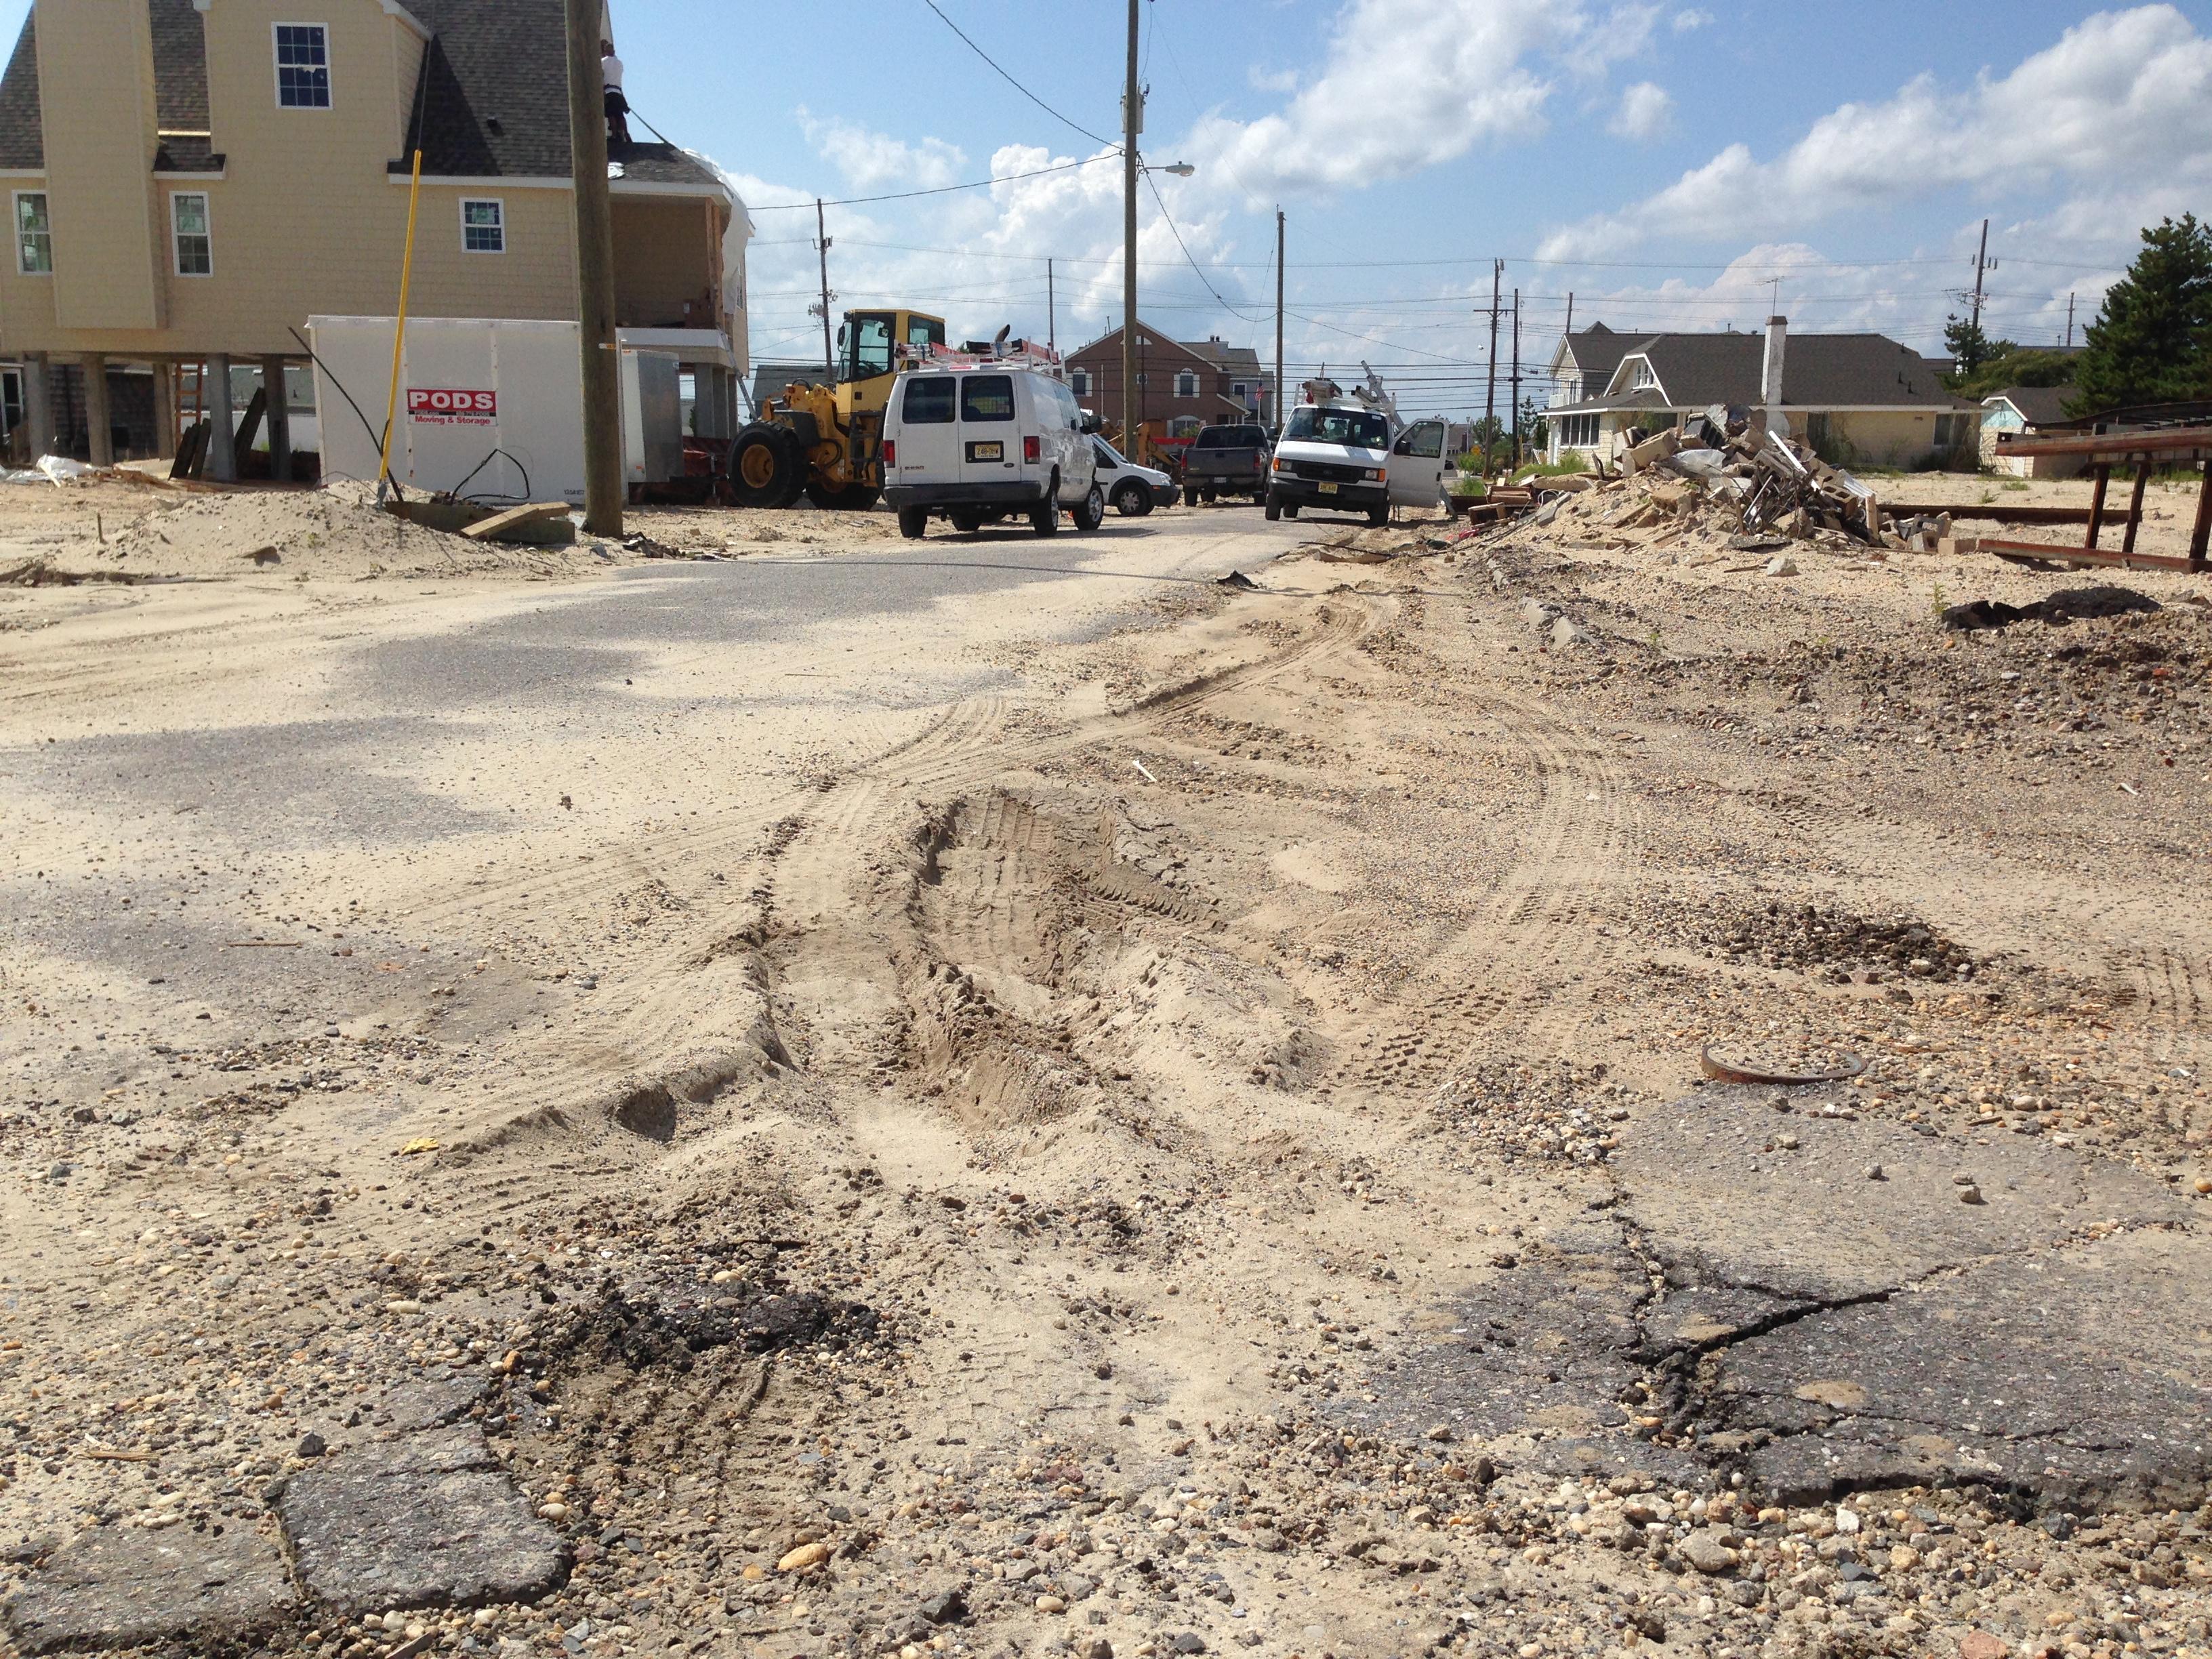 Jeanette Drive in Brick, N.J., being rebuilt after enduring damage during Superstorm Sandy. (Photo: Daniel Nee)